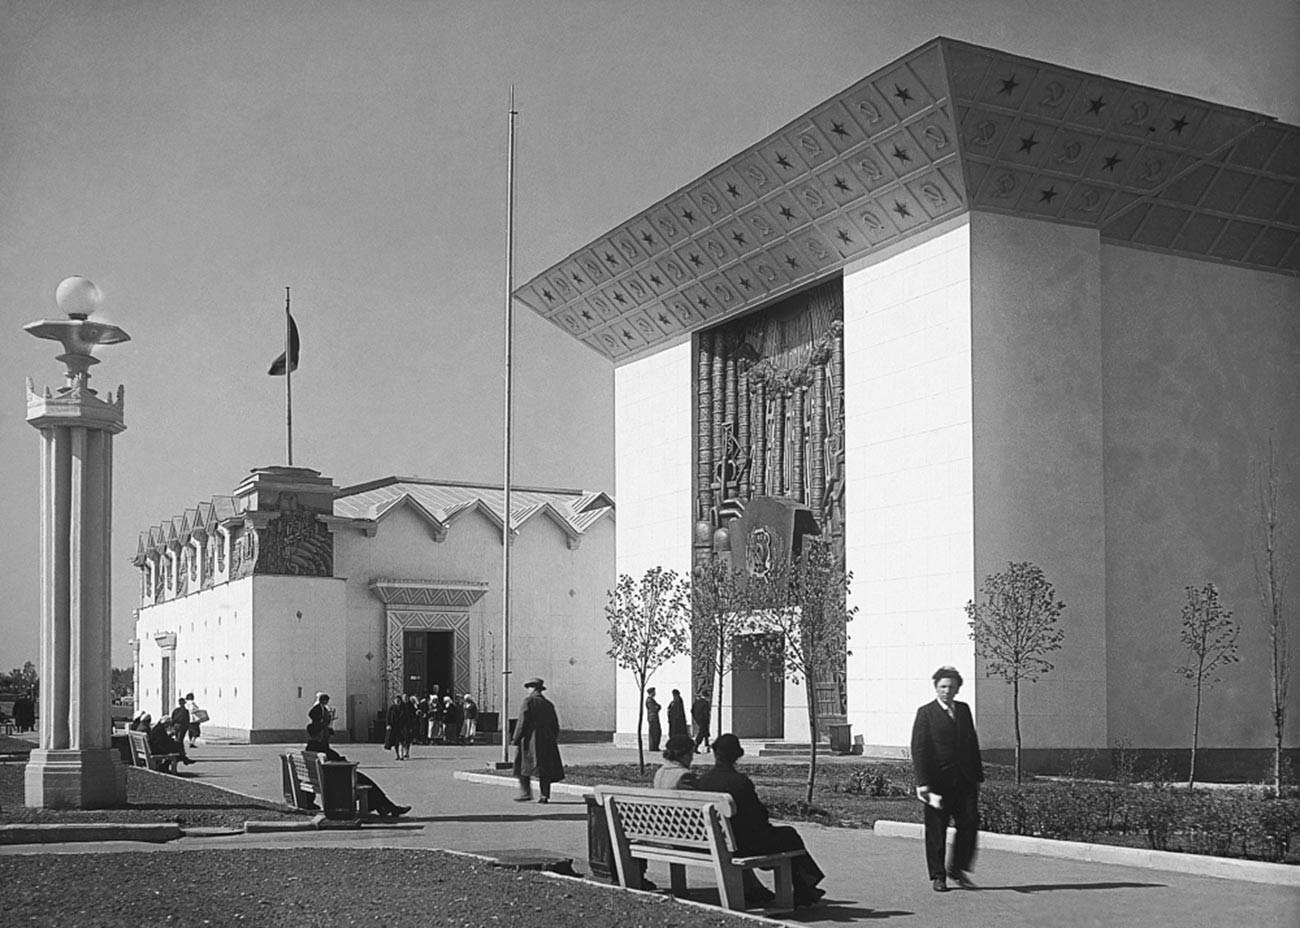 Naum Granovski. Izložba postignuća narodne privrede, Paviljon središnjih oblasti Ruske Sovjetske Federativne Socijalističke Republike, 1939.